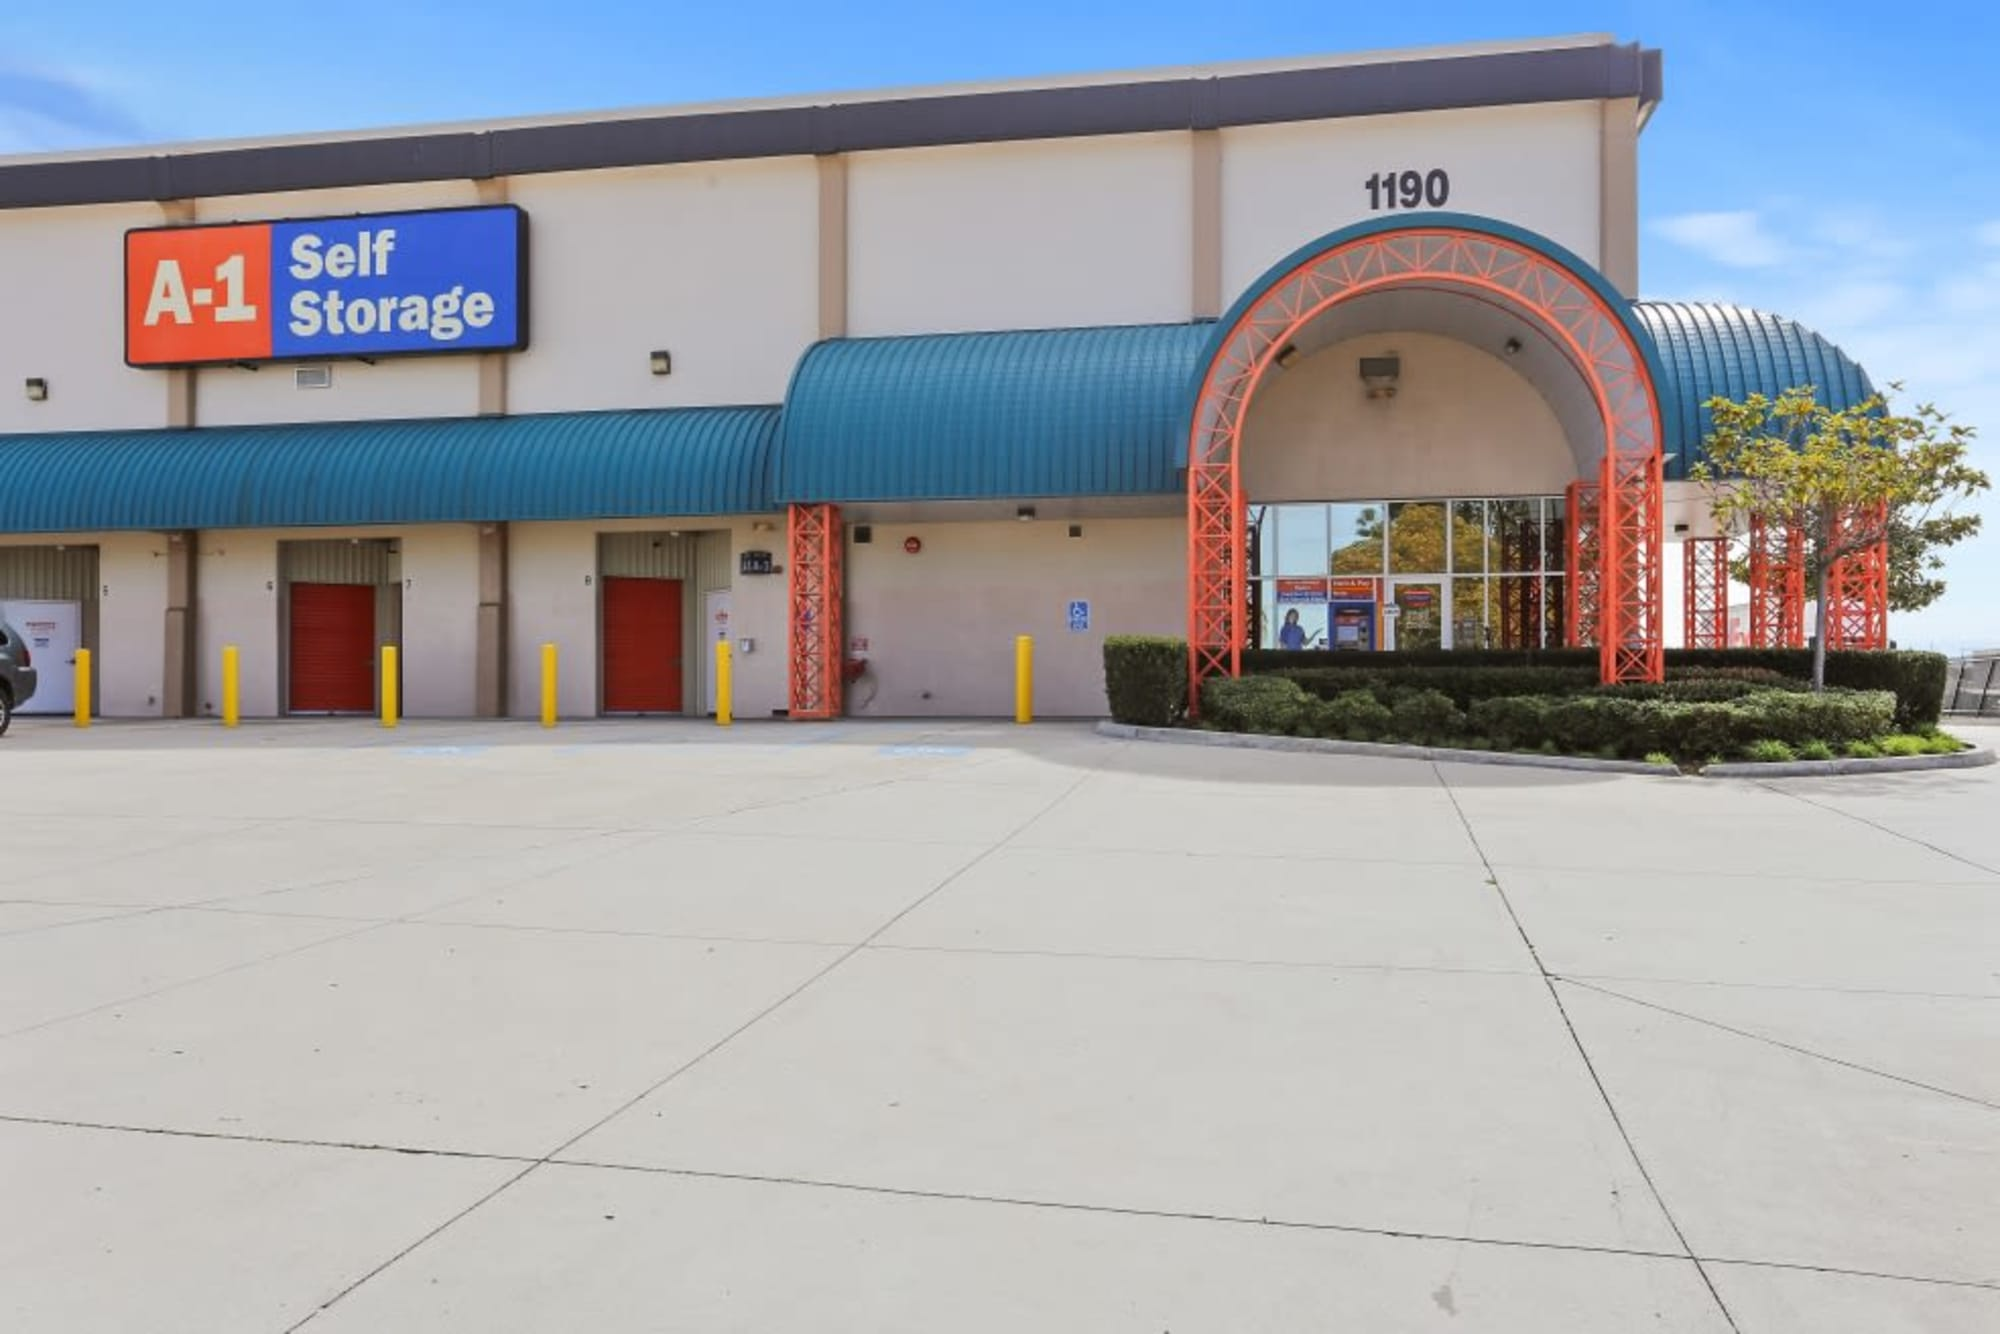 Exterior Storage units at A-1 Self Storage in San Diego, California